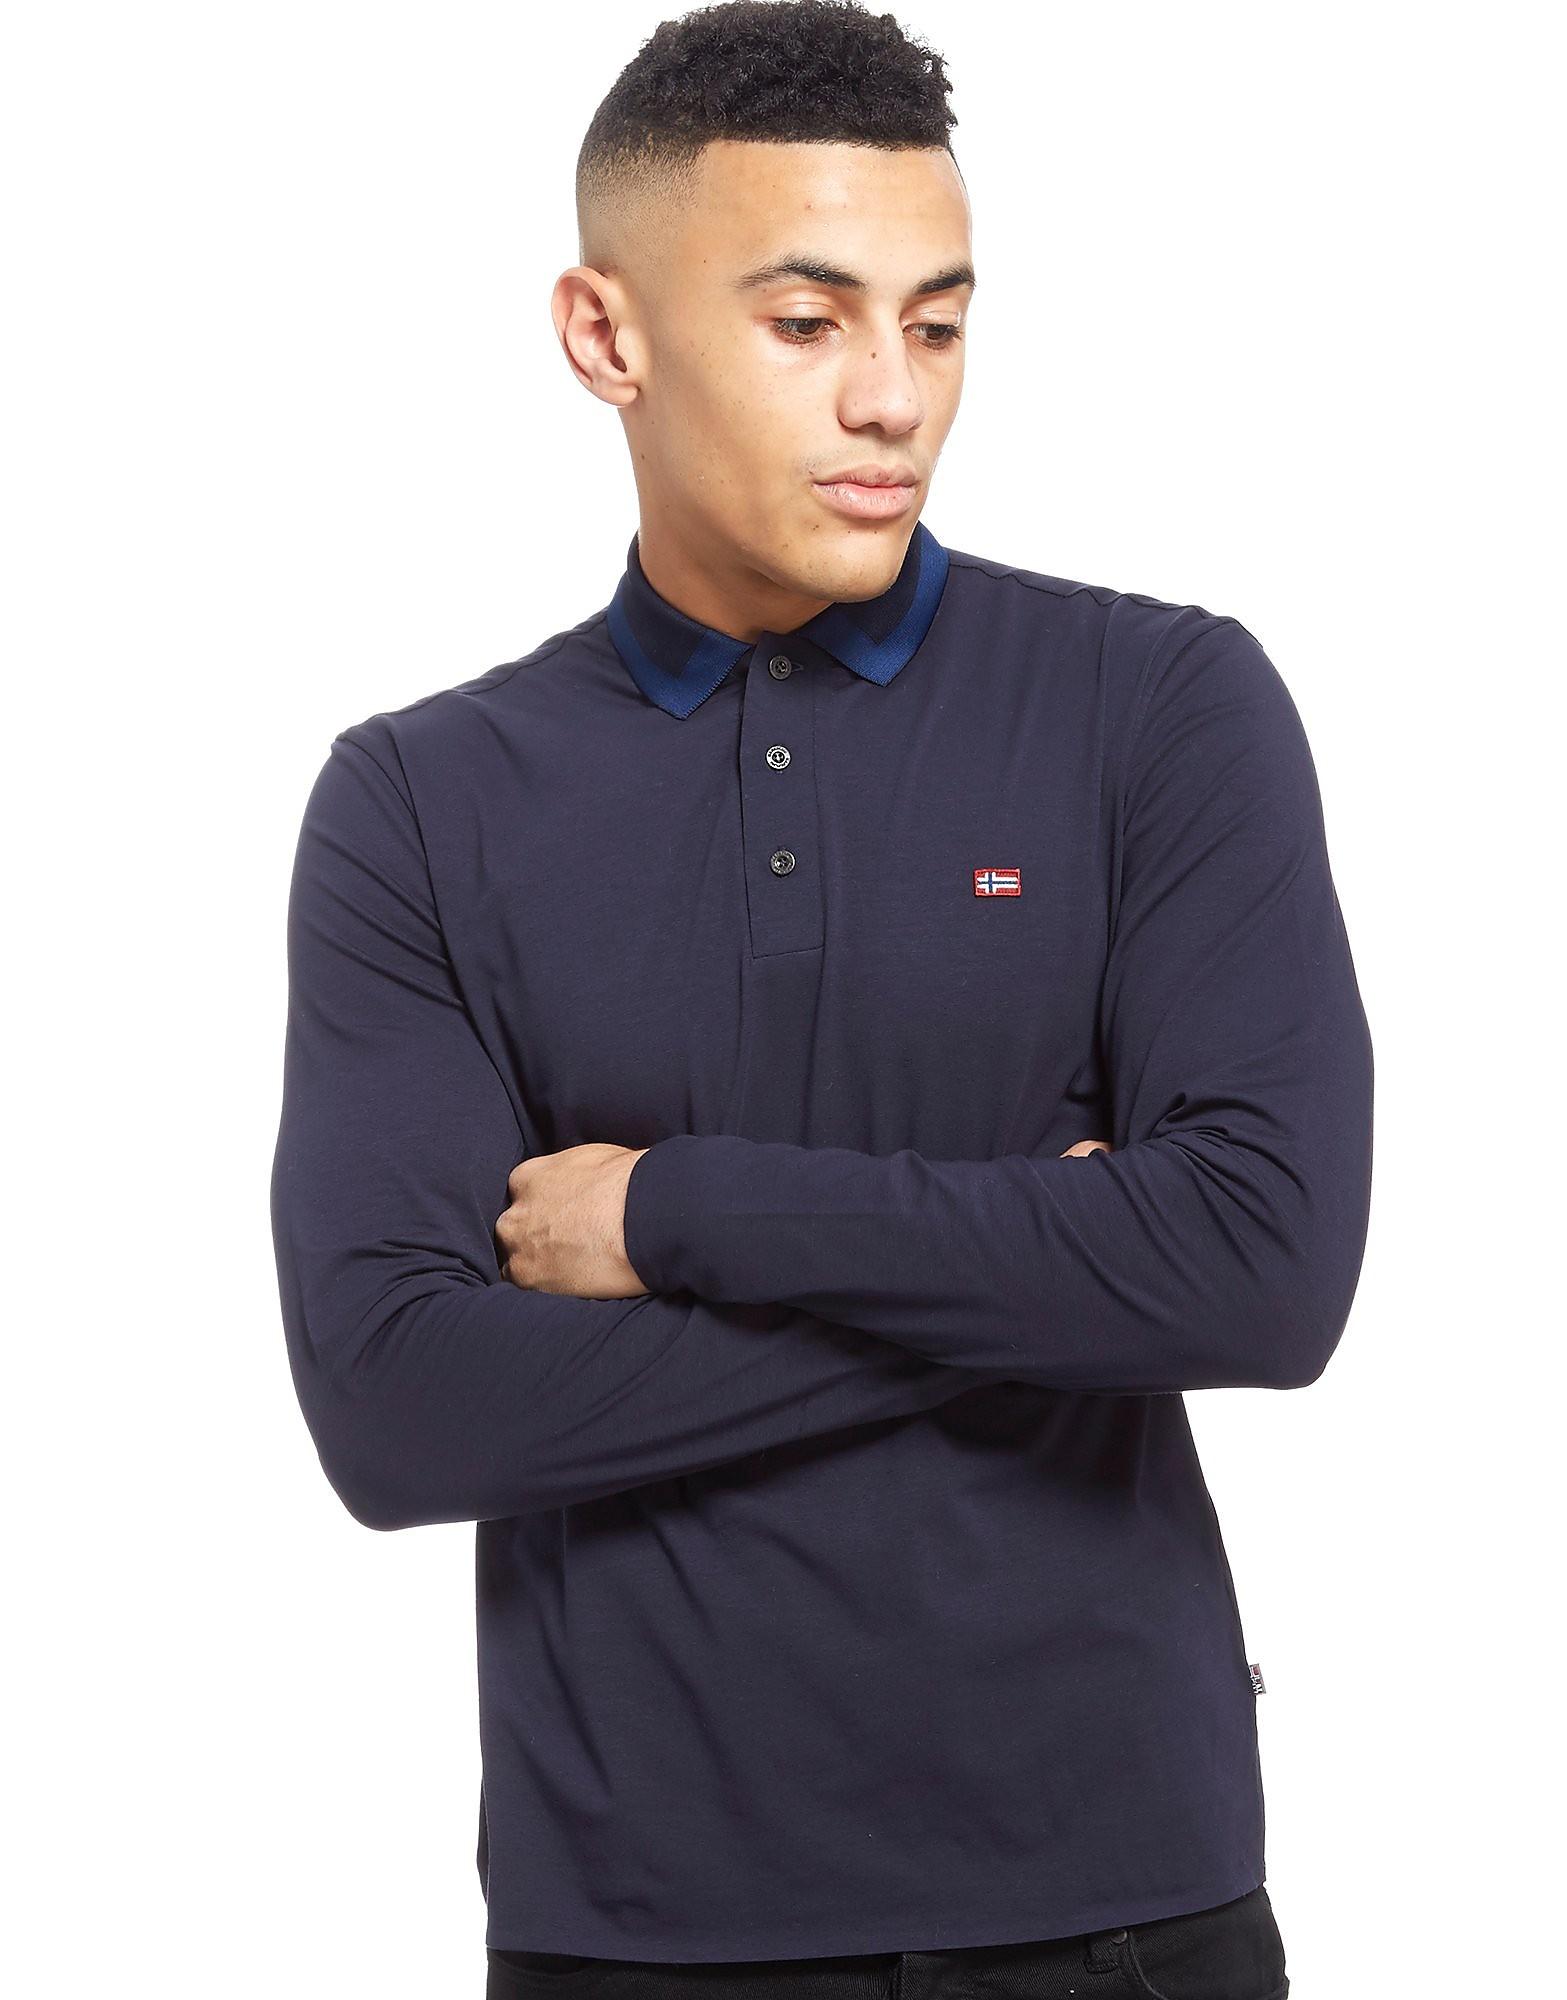 Napapijri Elim Long Sleeve Polo Shirt